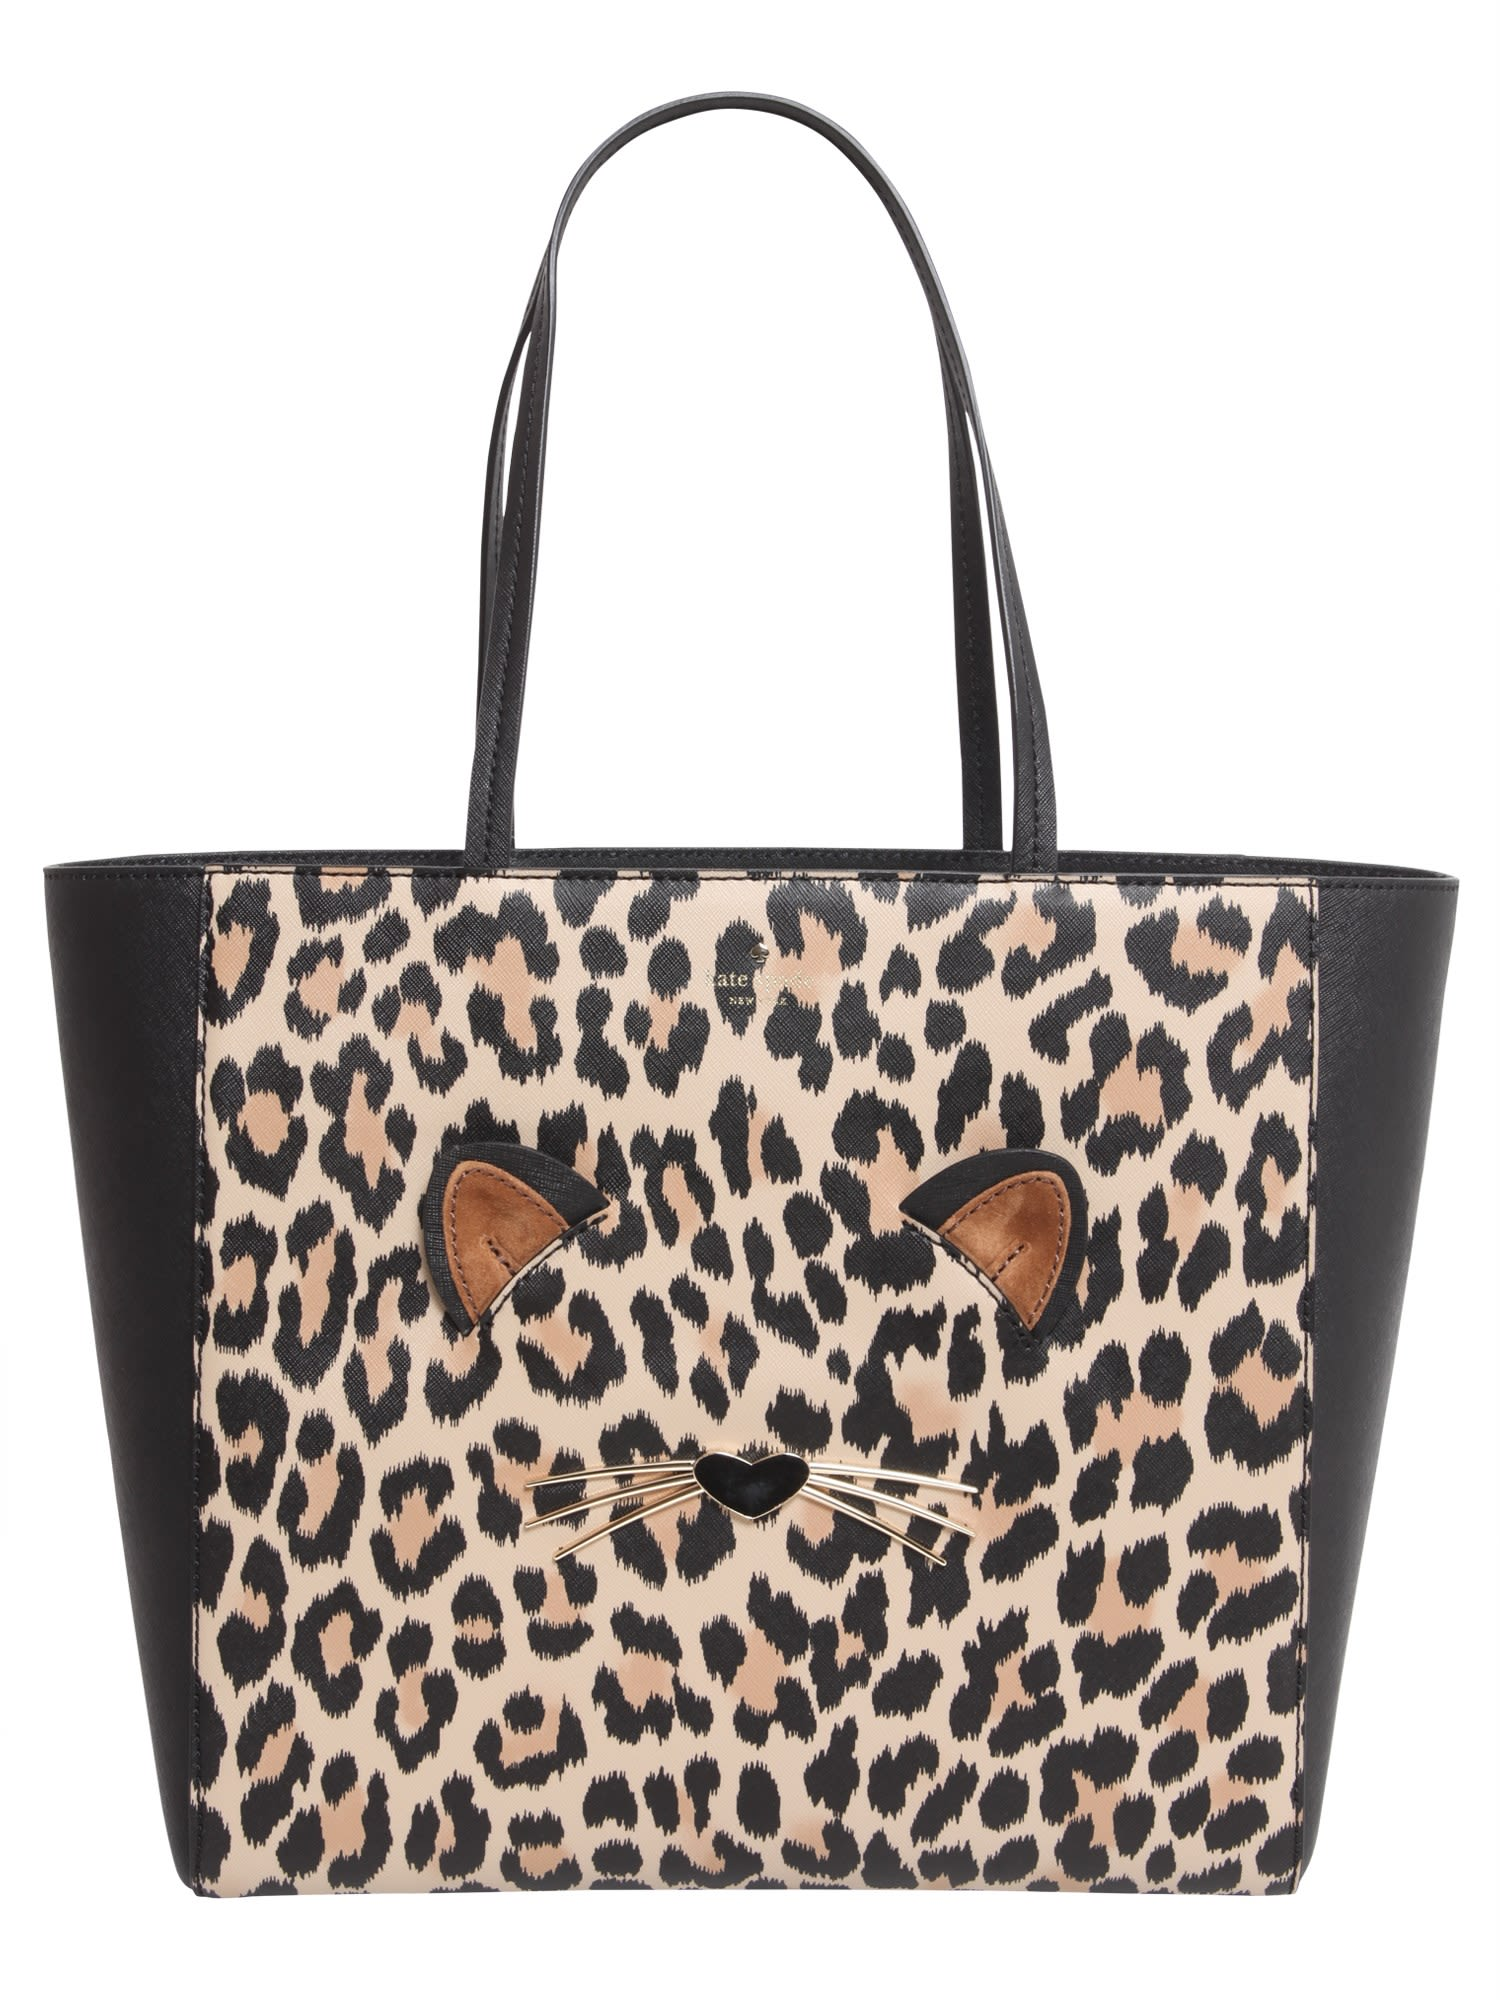 Kate Spade Hallie Leopard Shopping Bag